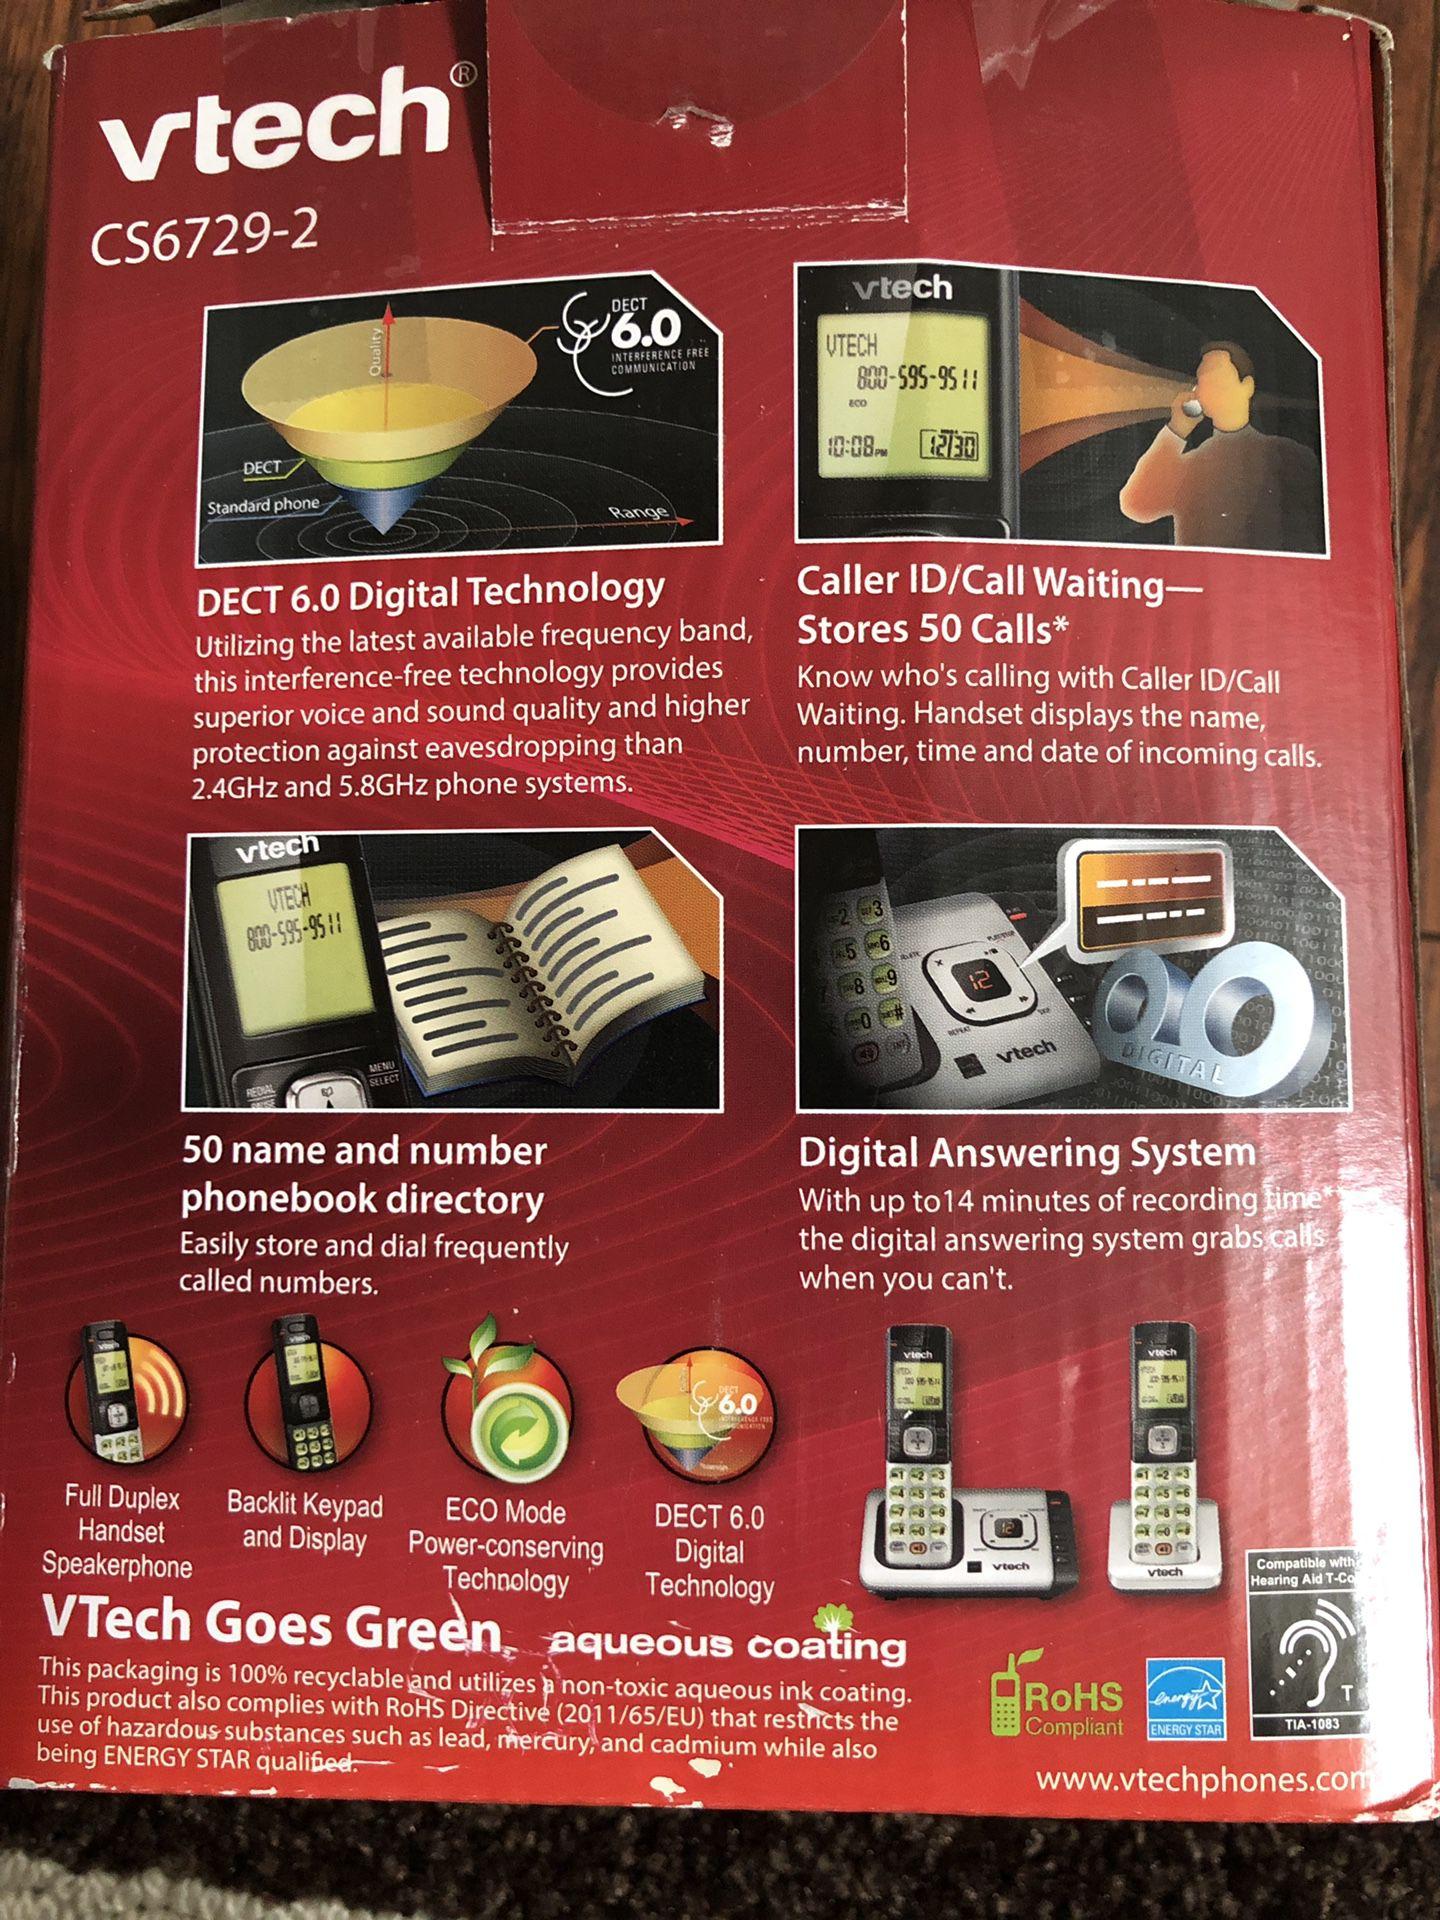 Vetch Wireless phone